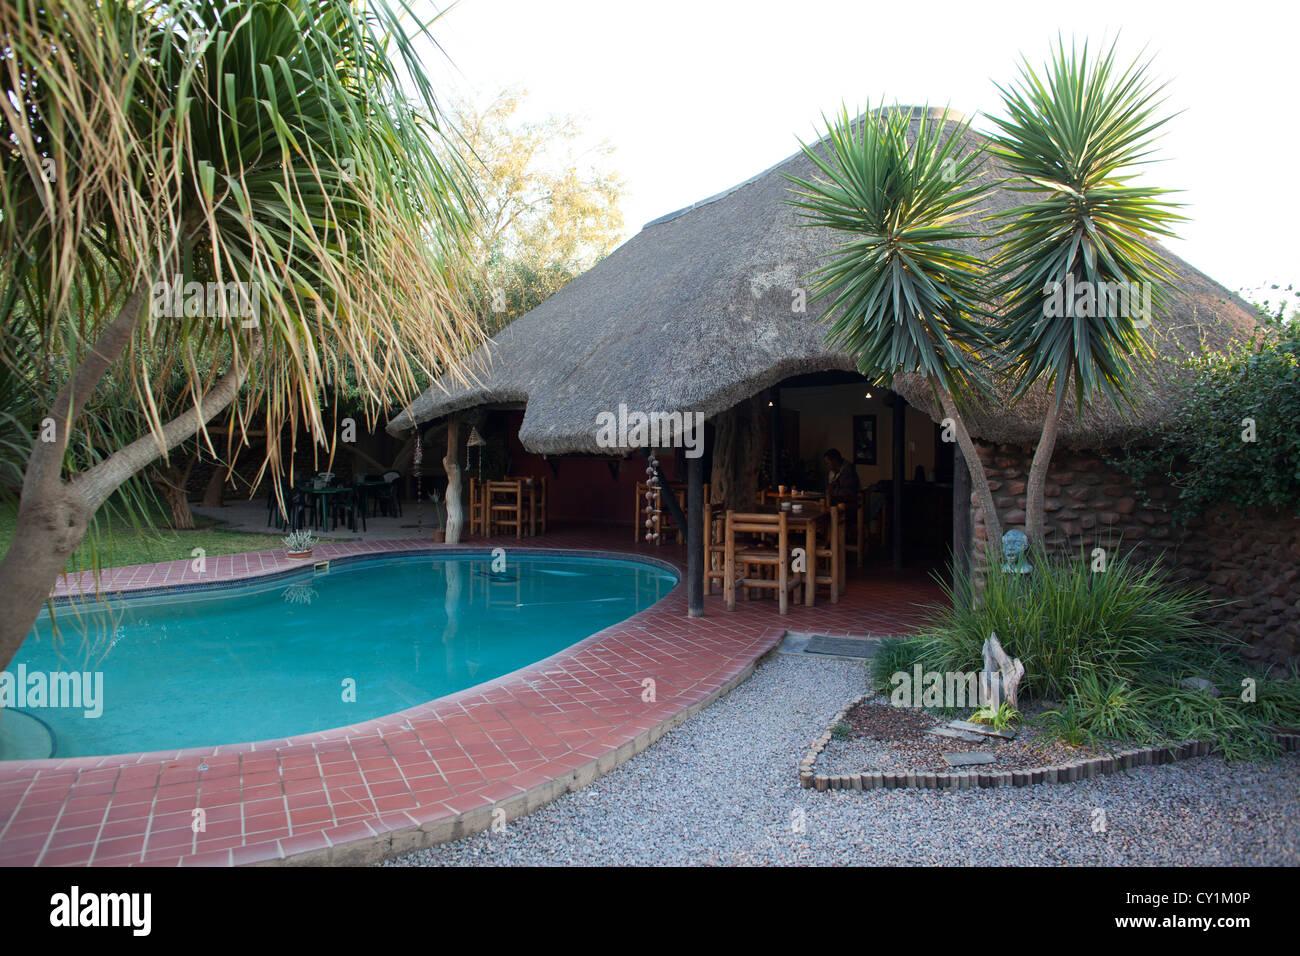 hotel in Opuwo, namibia - Stock Image